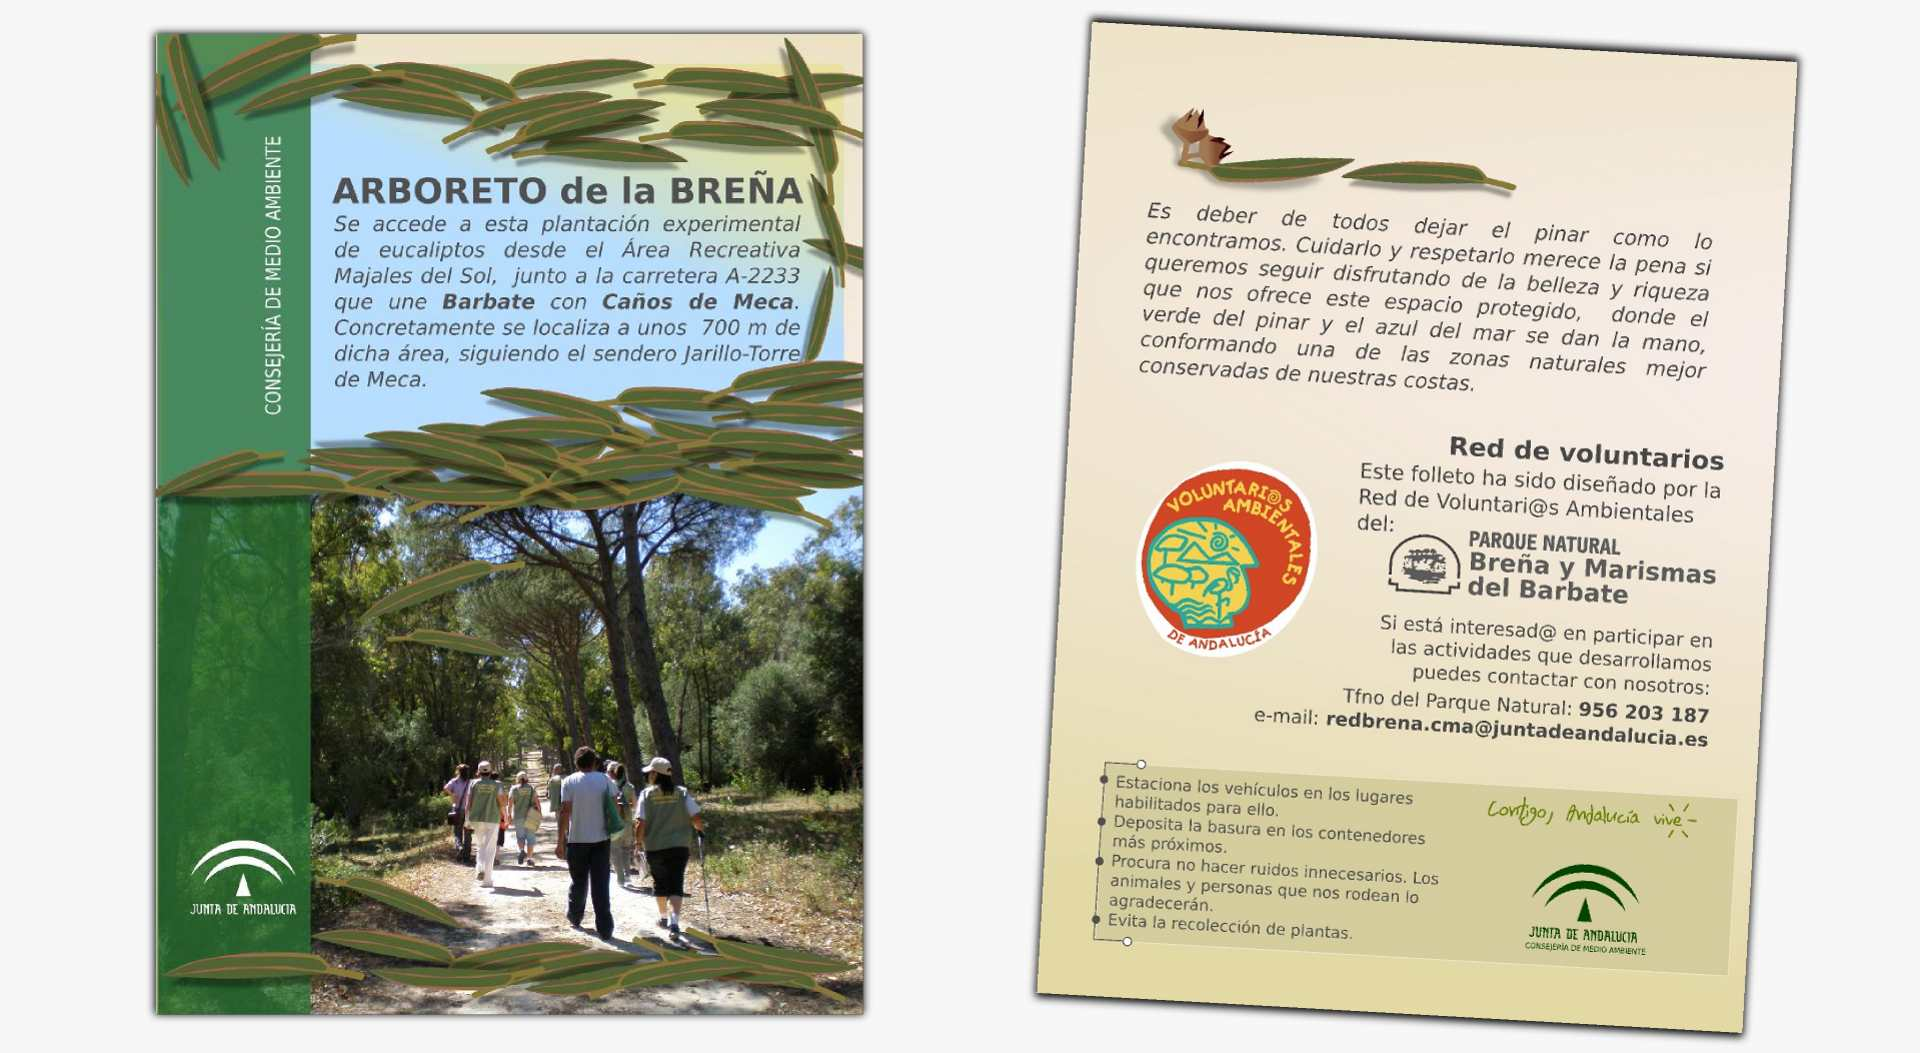 Arboreto de eucalipto adsise dise o de la informaci n - Informacion sobre el eucalipto ...